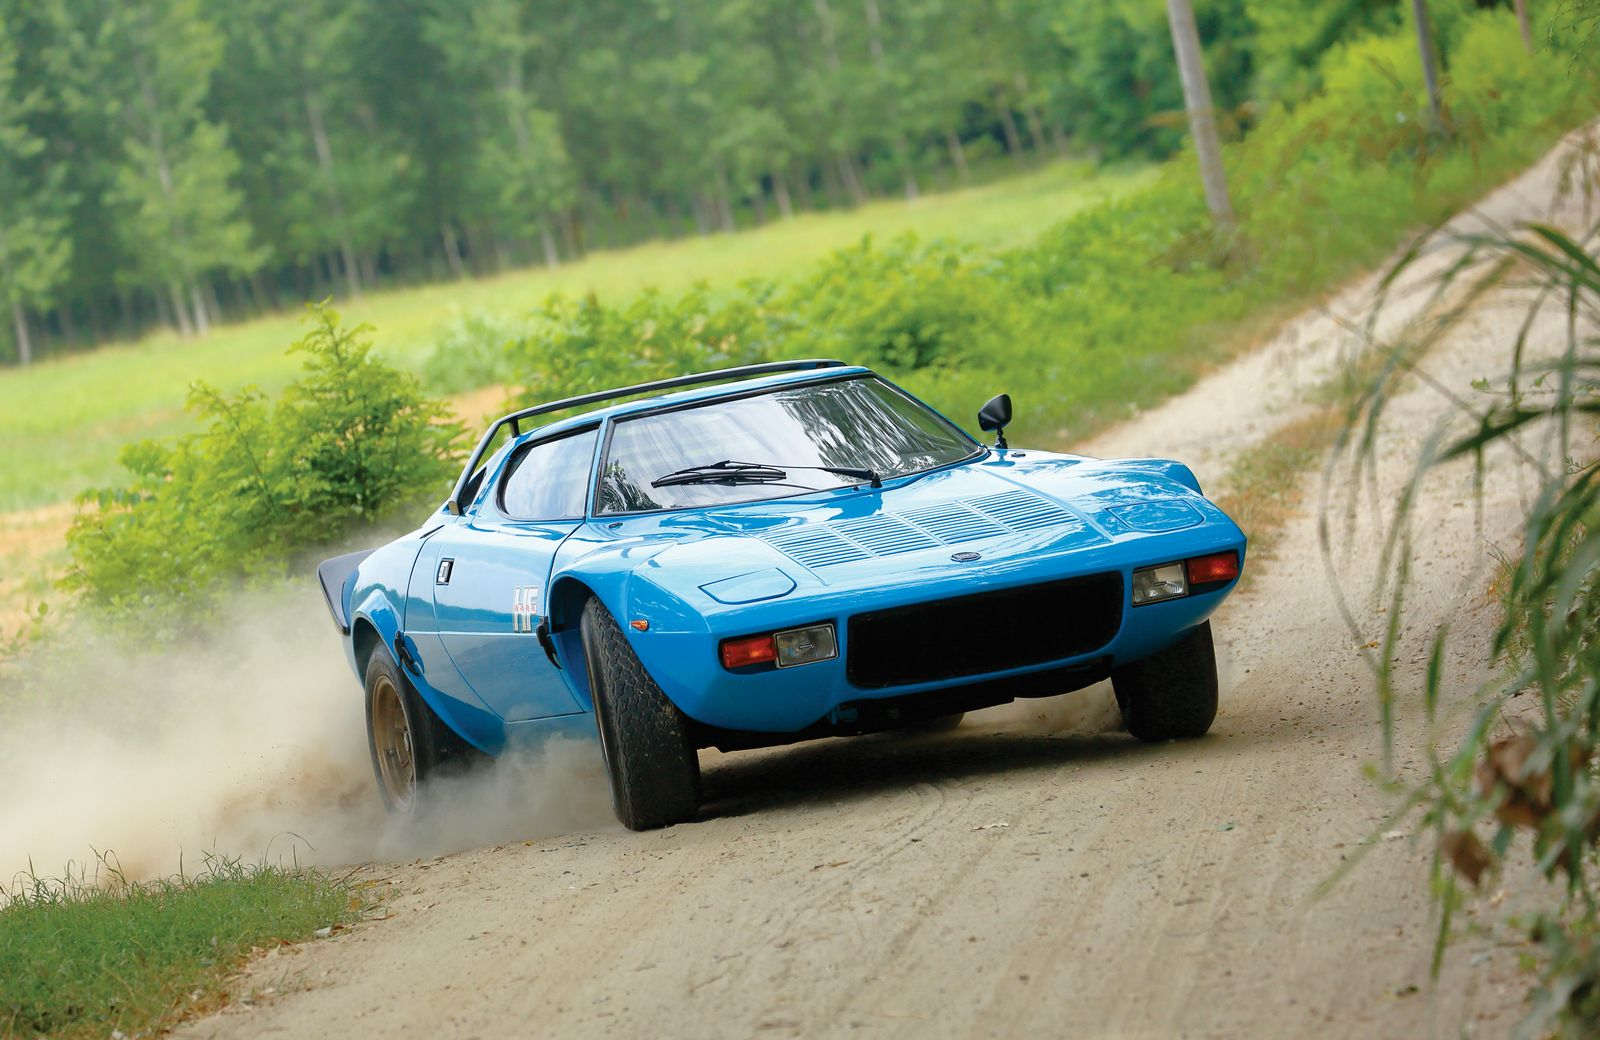 Mclaren For Sale >> RM Sotheby's Selling Blue Lancia Stratos HF Stradale - GTspirit